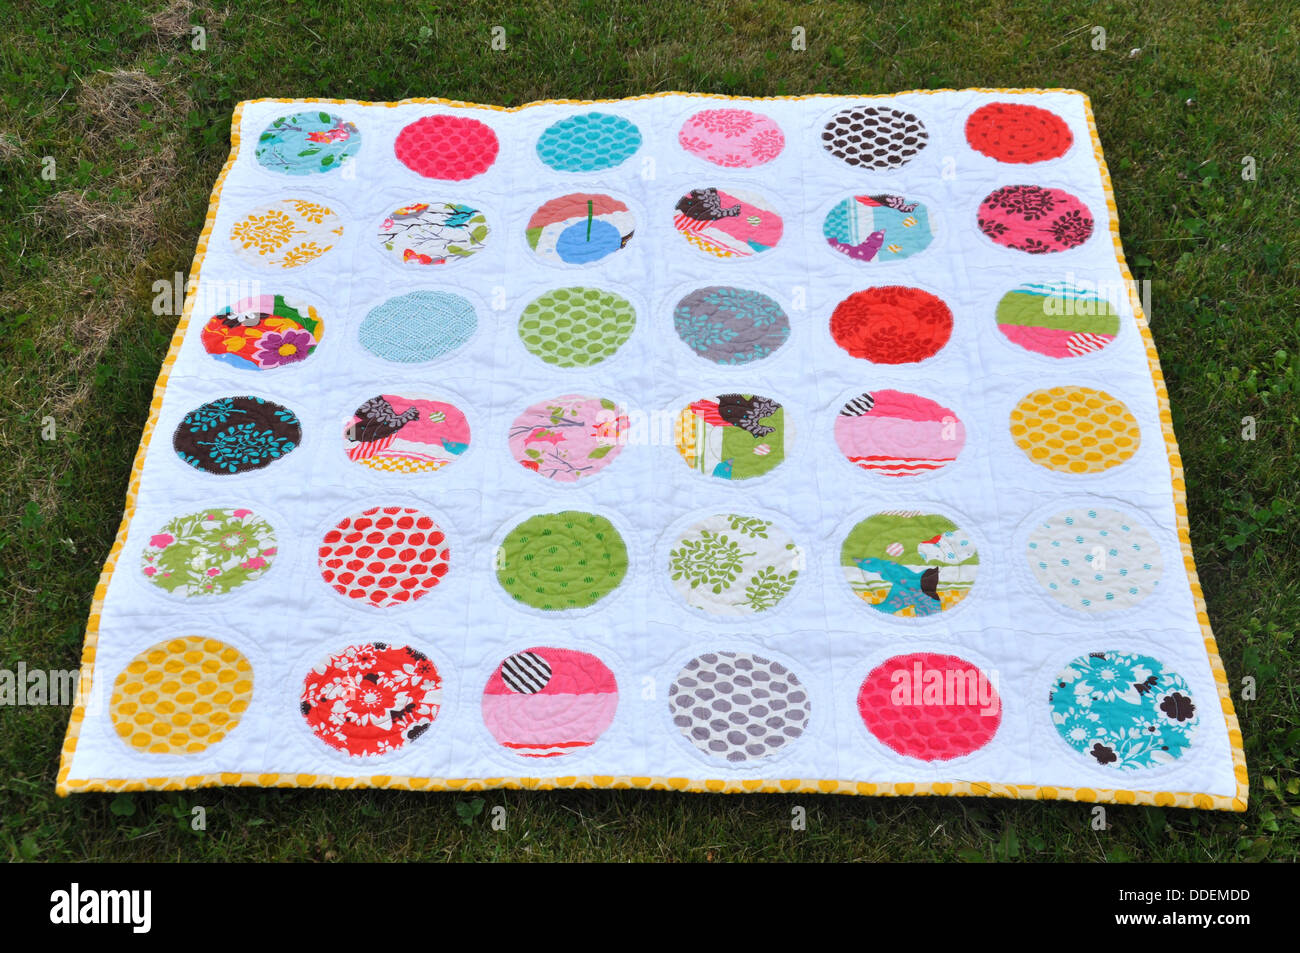 Applique kreise baby quilt stockfoto bild  alamy